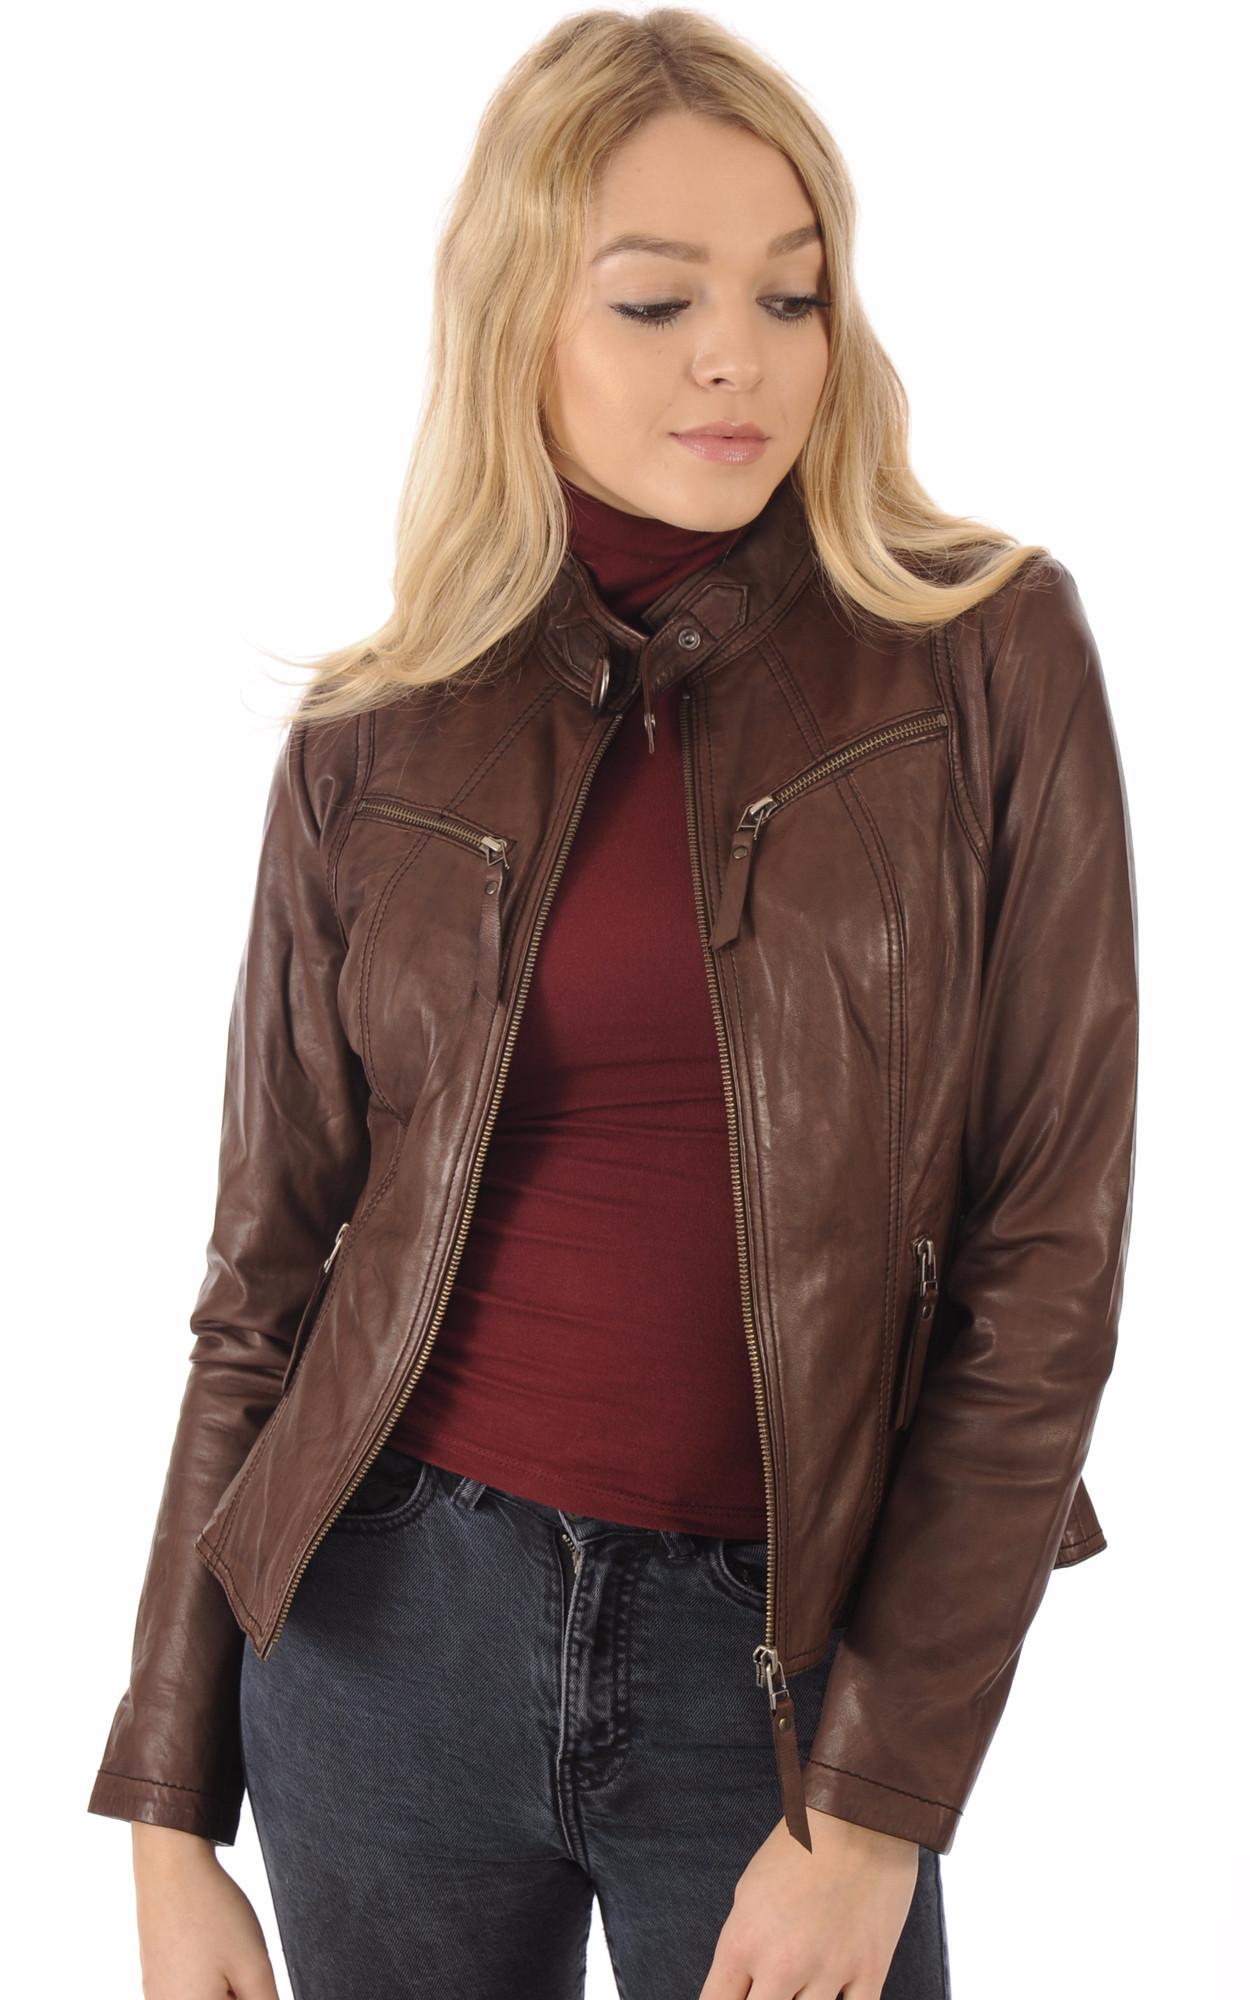 Veste cuir marron clair femme